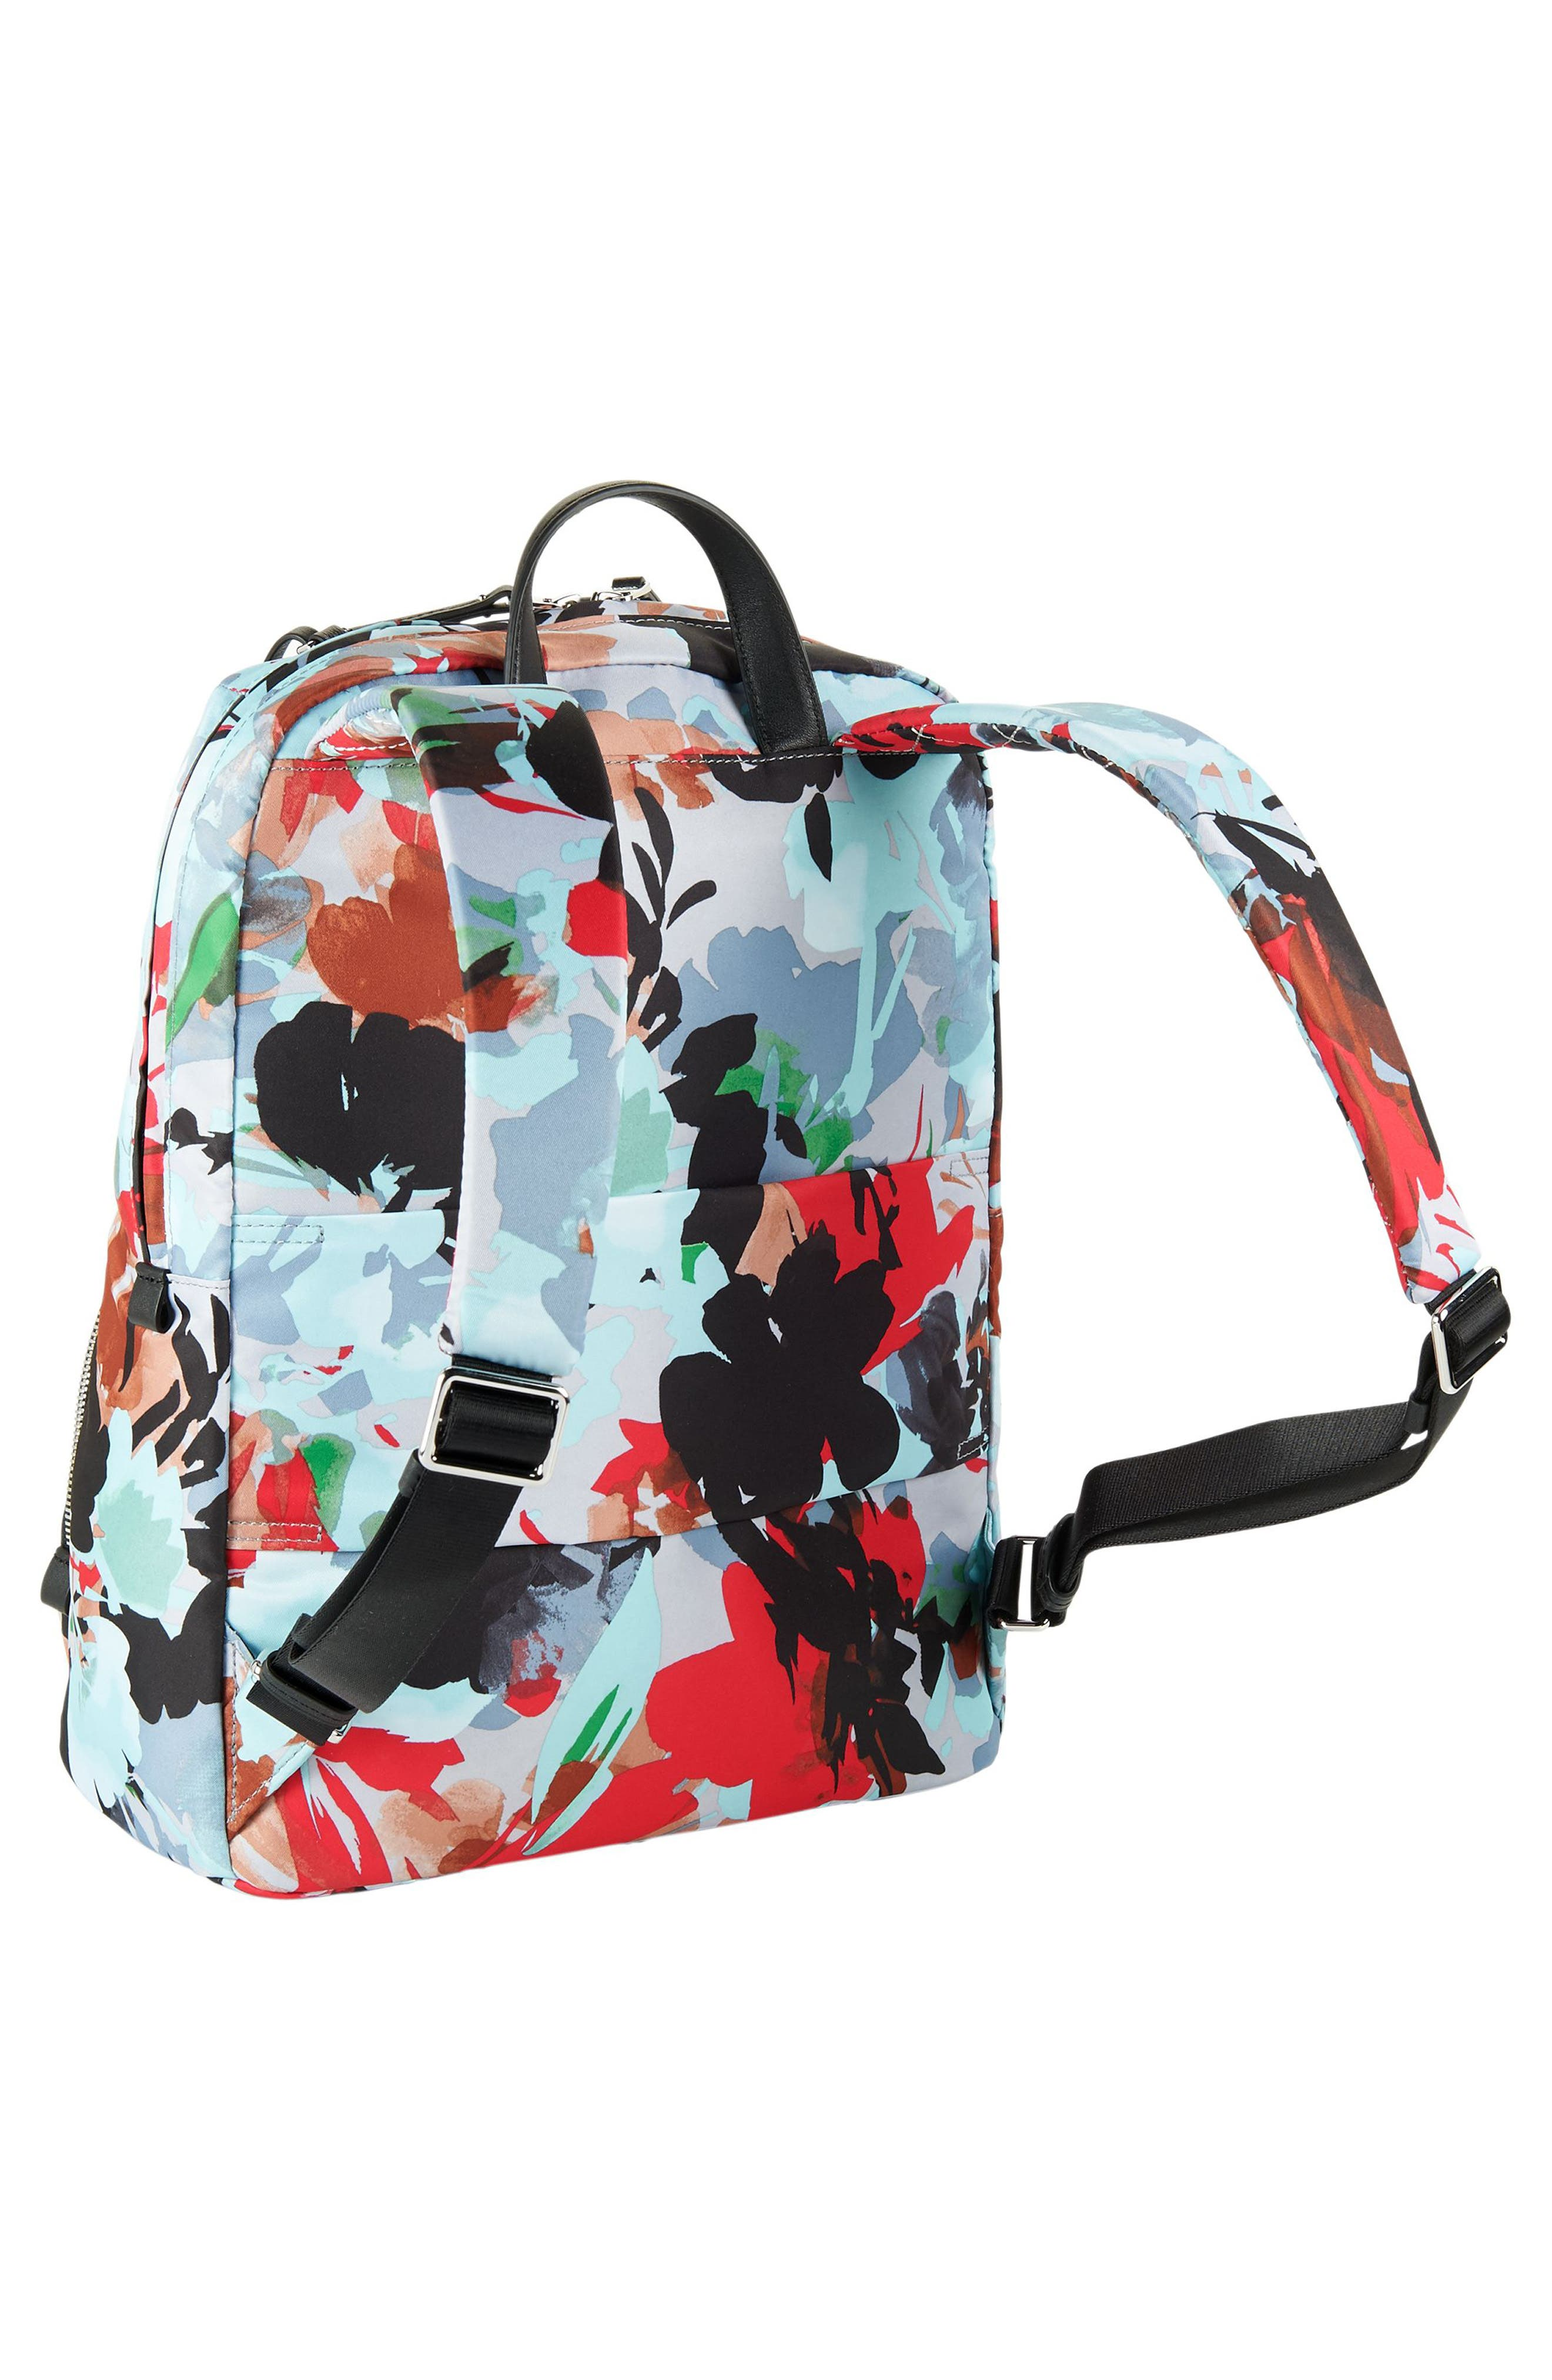 Voyageur Halle Nylon Backpack,                             Alternate thumbnail 3, color,                             Pacific Floral